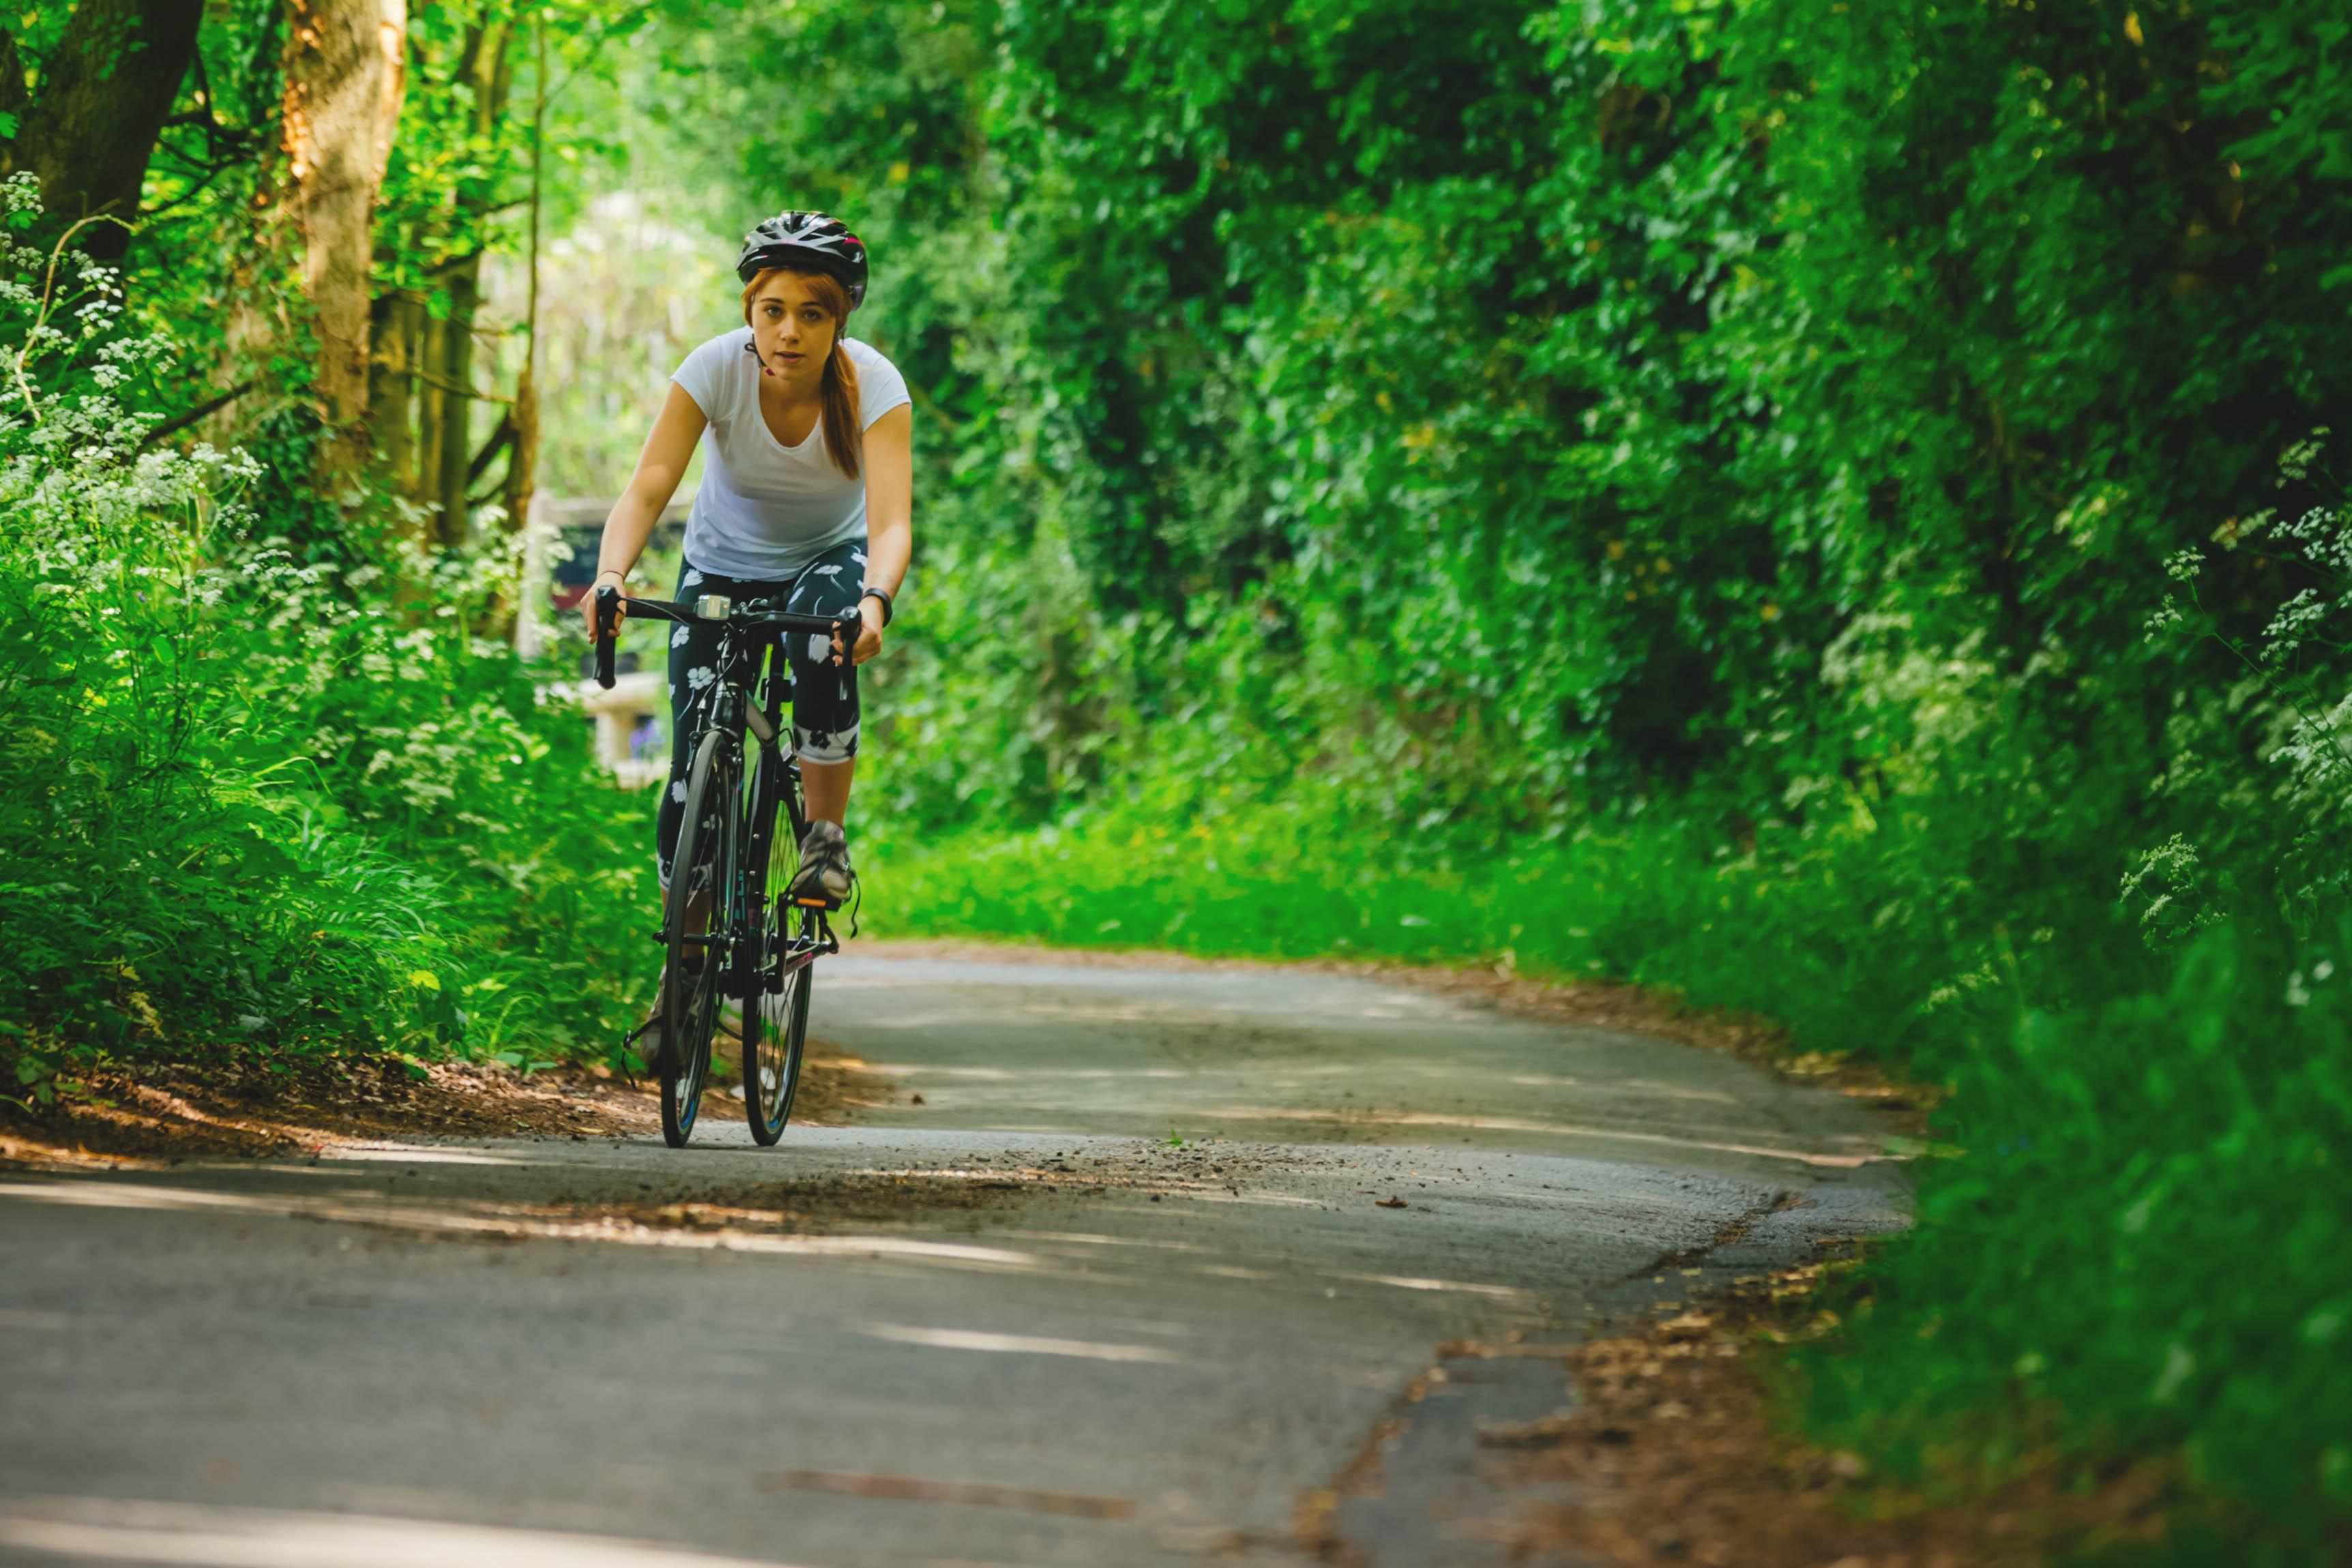 Women's Specific Bikes